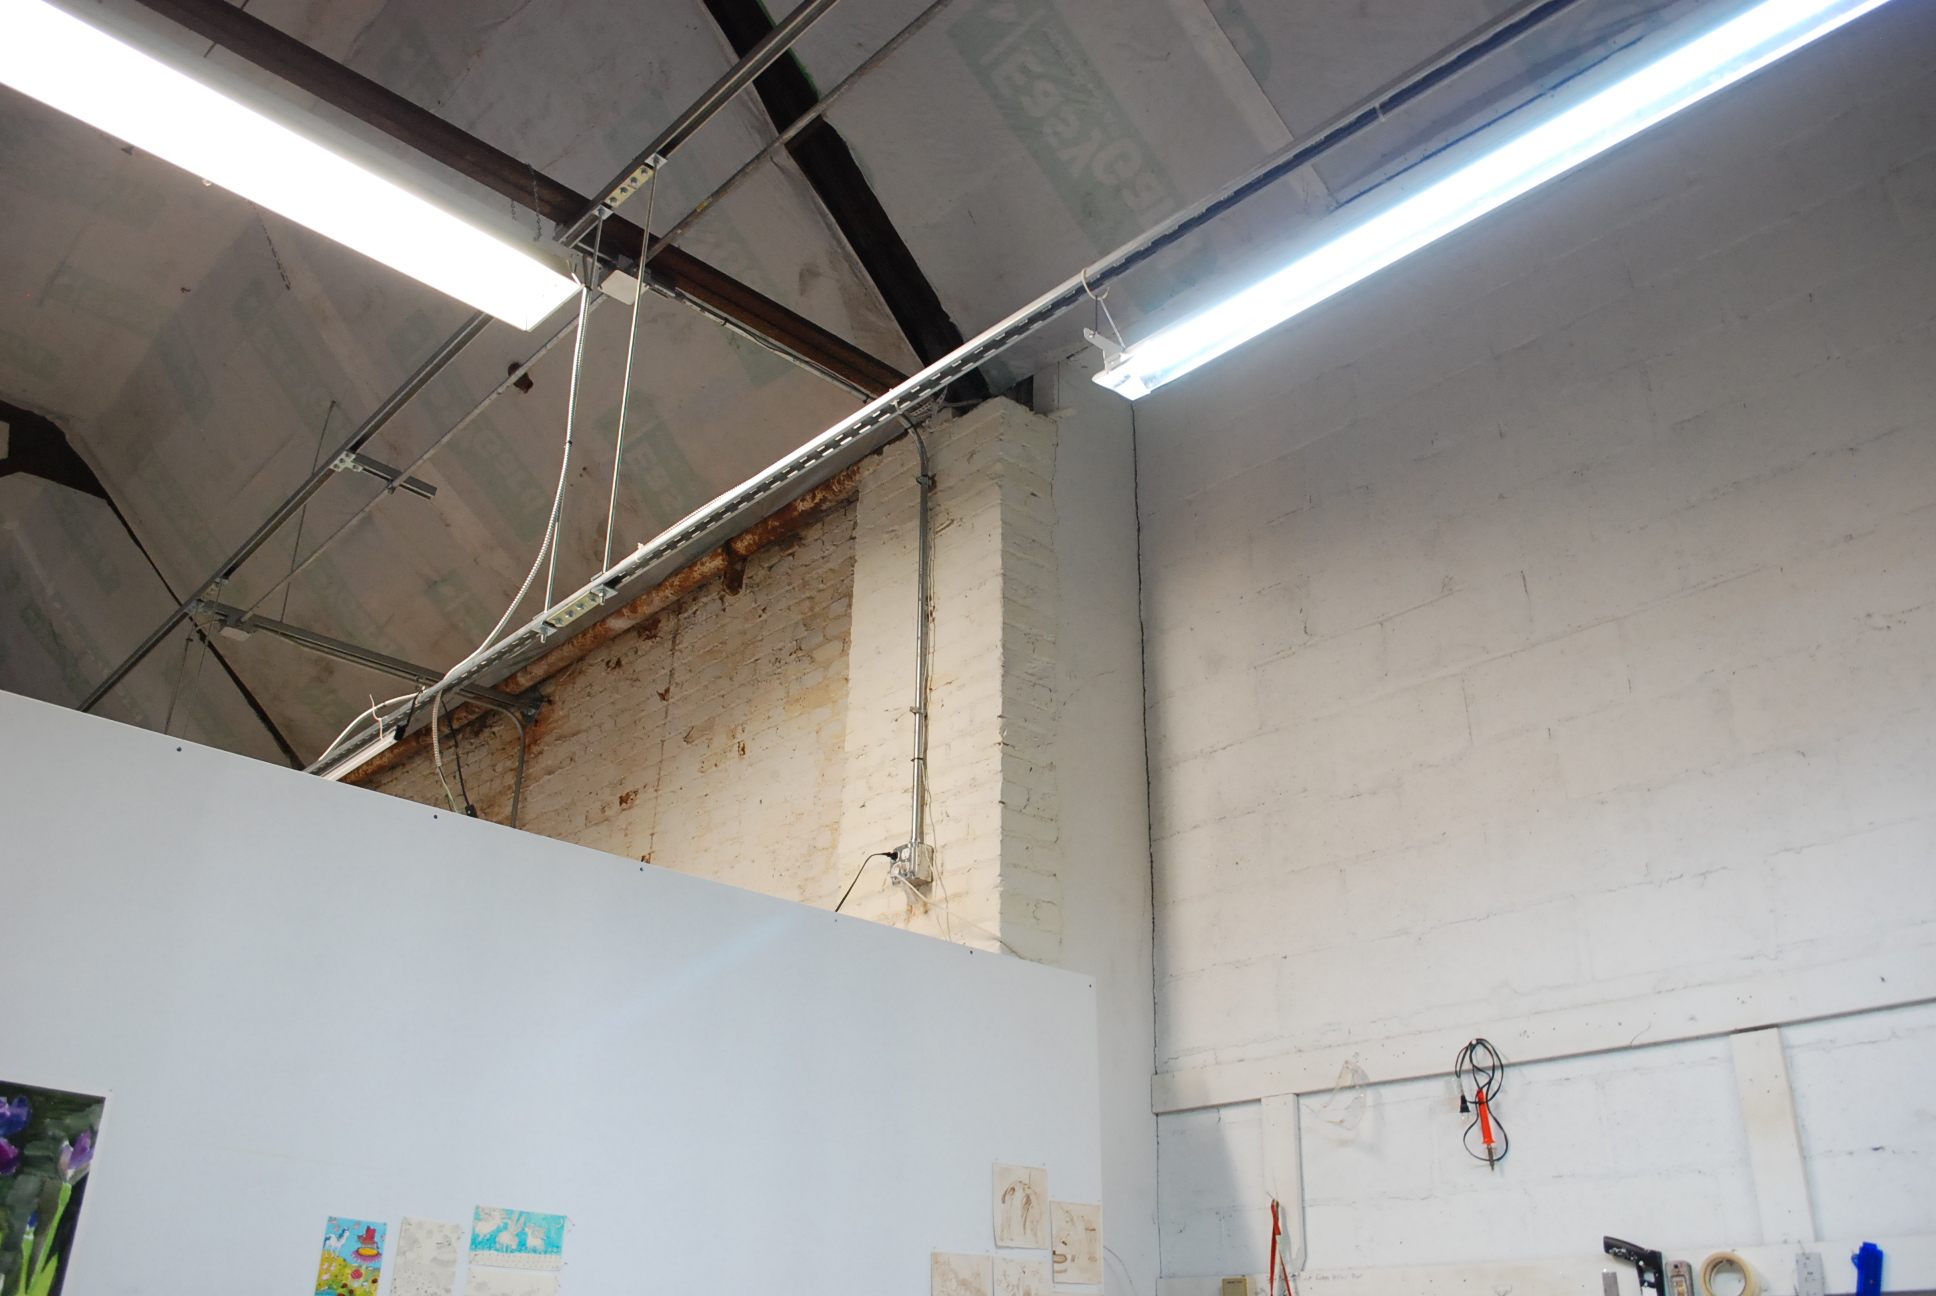 Looking for a Studio Space Caranne Camarena painting 12 Opens Vulpes Bastille Artist Studios